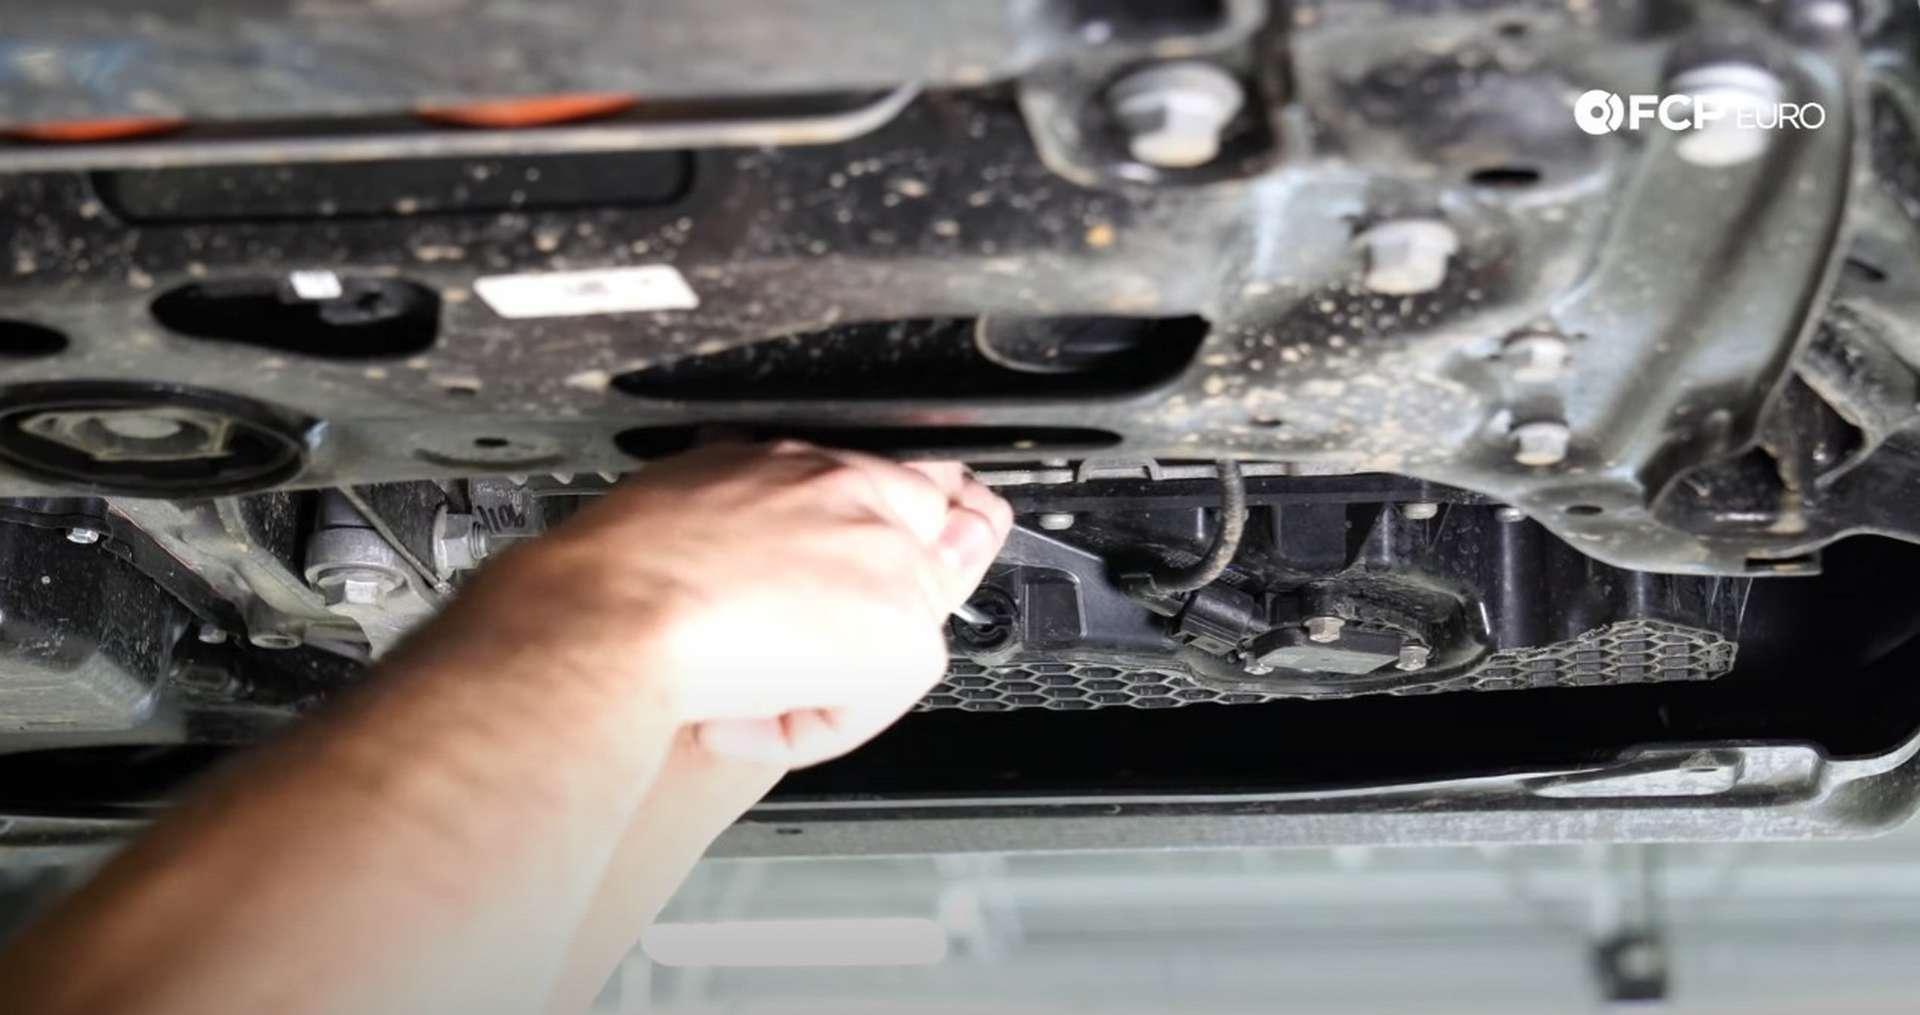 DIY Volkswagen EA888 Oil Change removing the drain plug